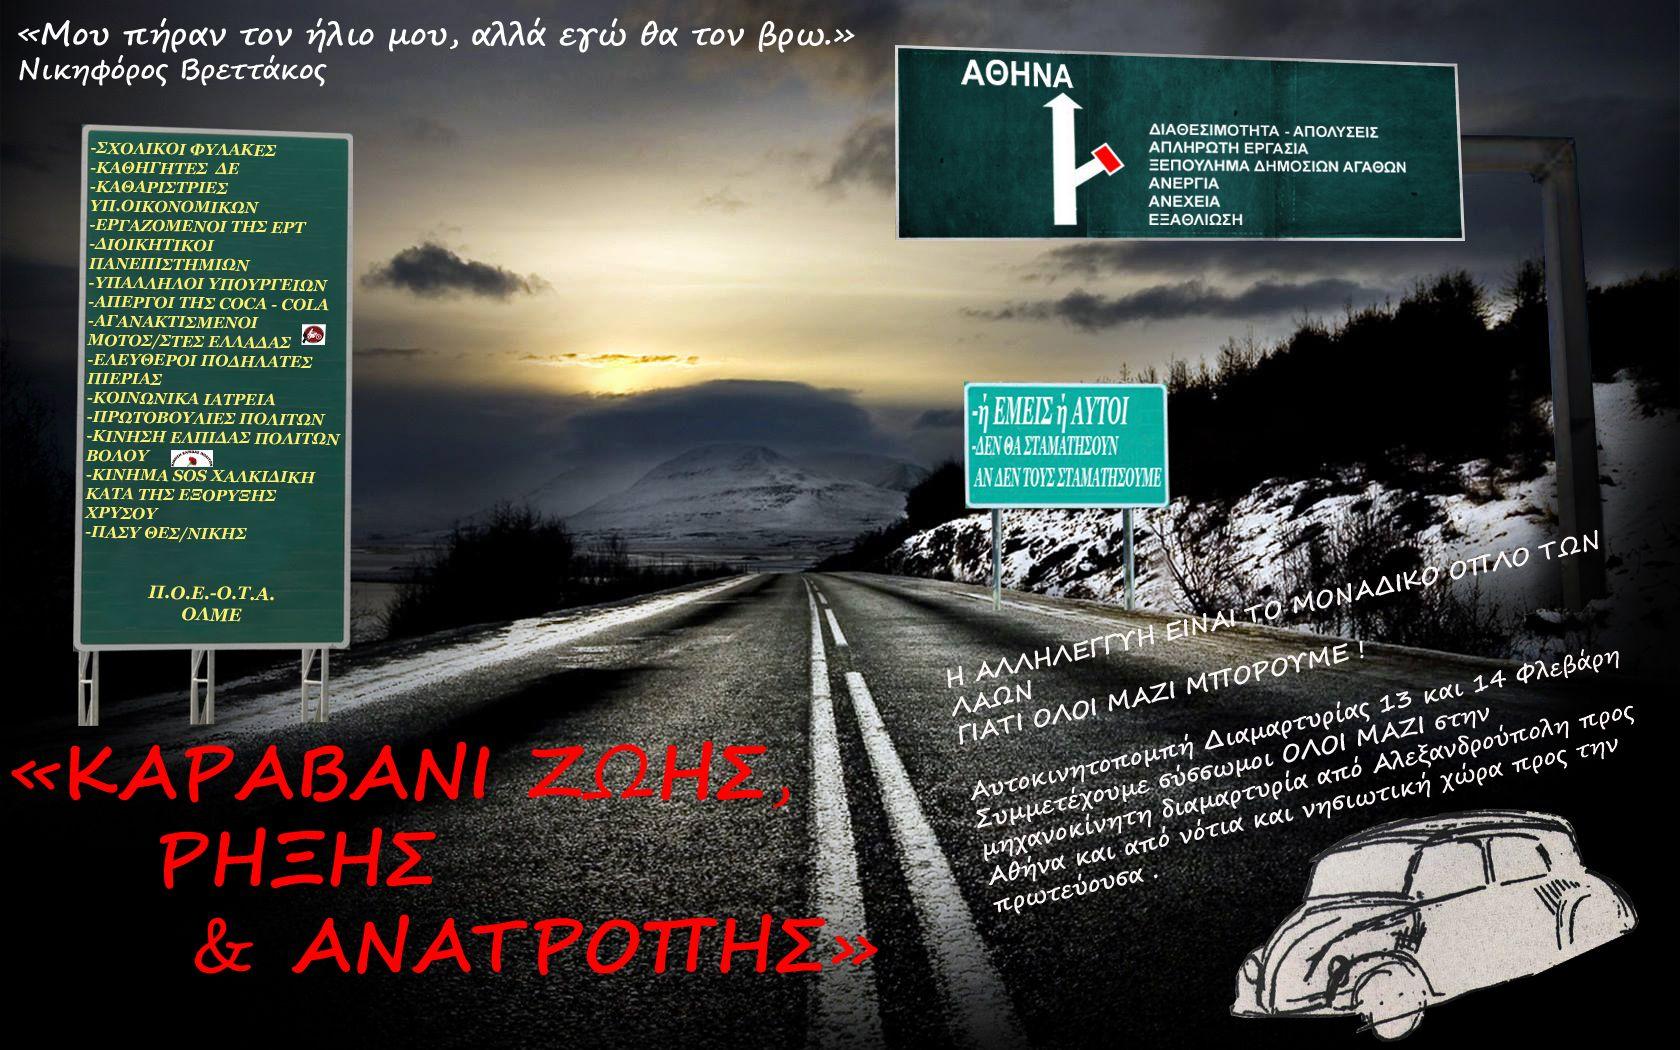 alfavita.gr, σχολικοί φύλακες